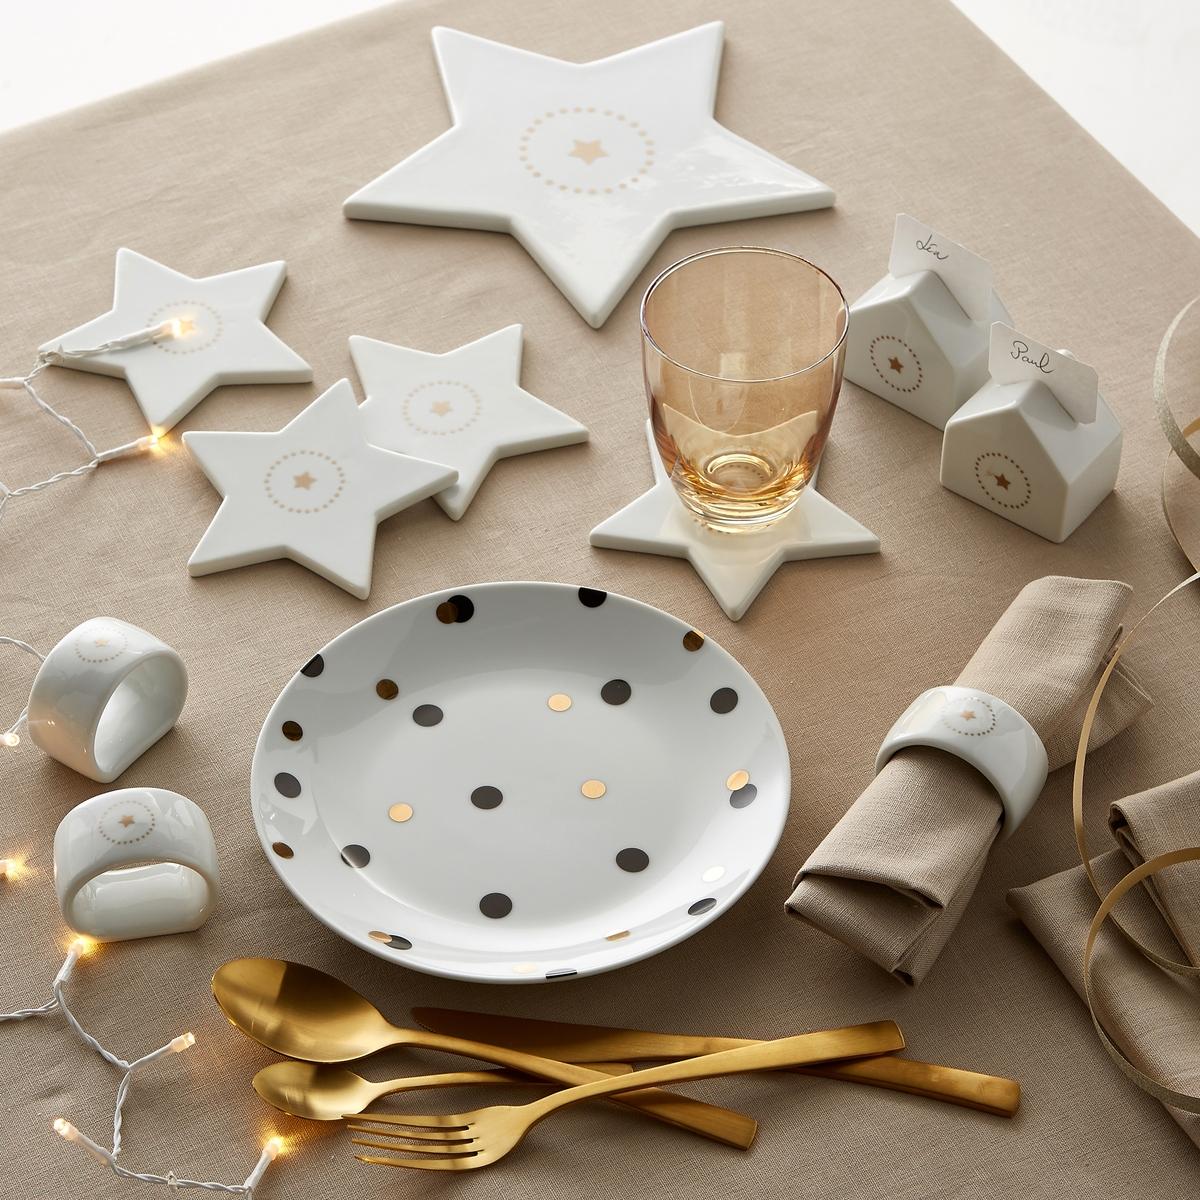 Подставка для блюда в форме звезды из фарфора, Kubler от La Redoute